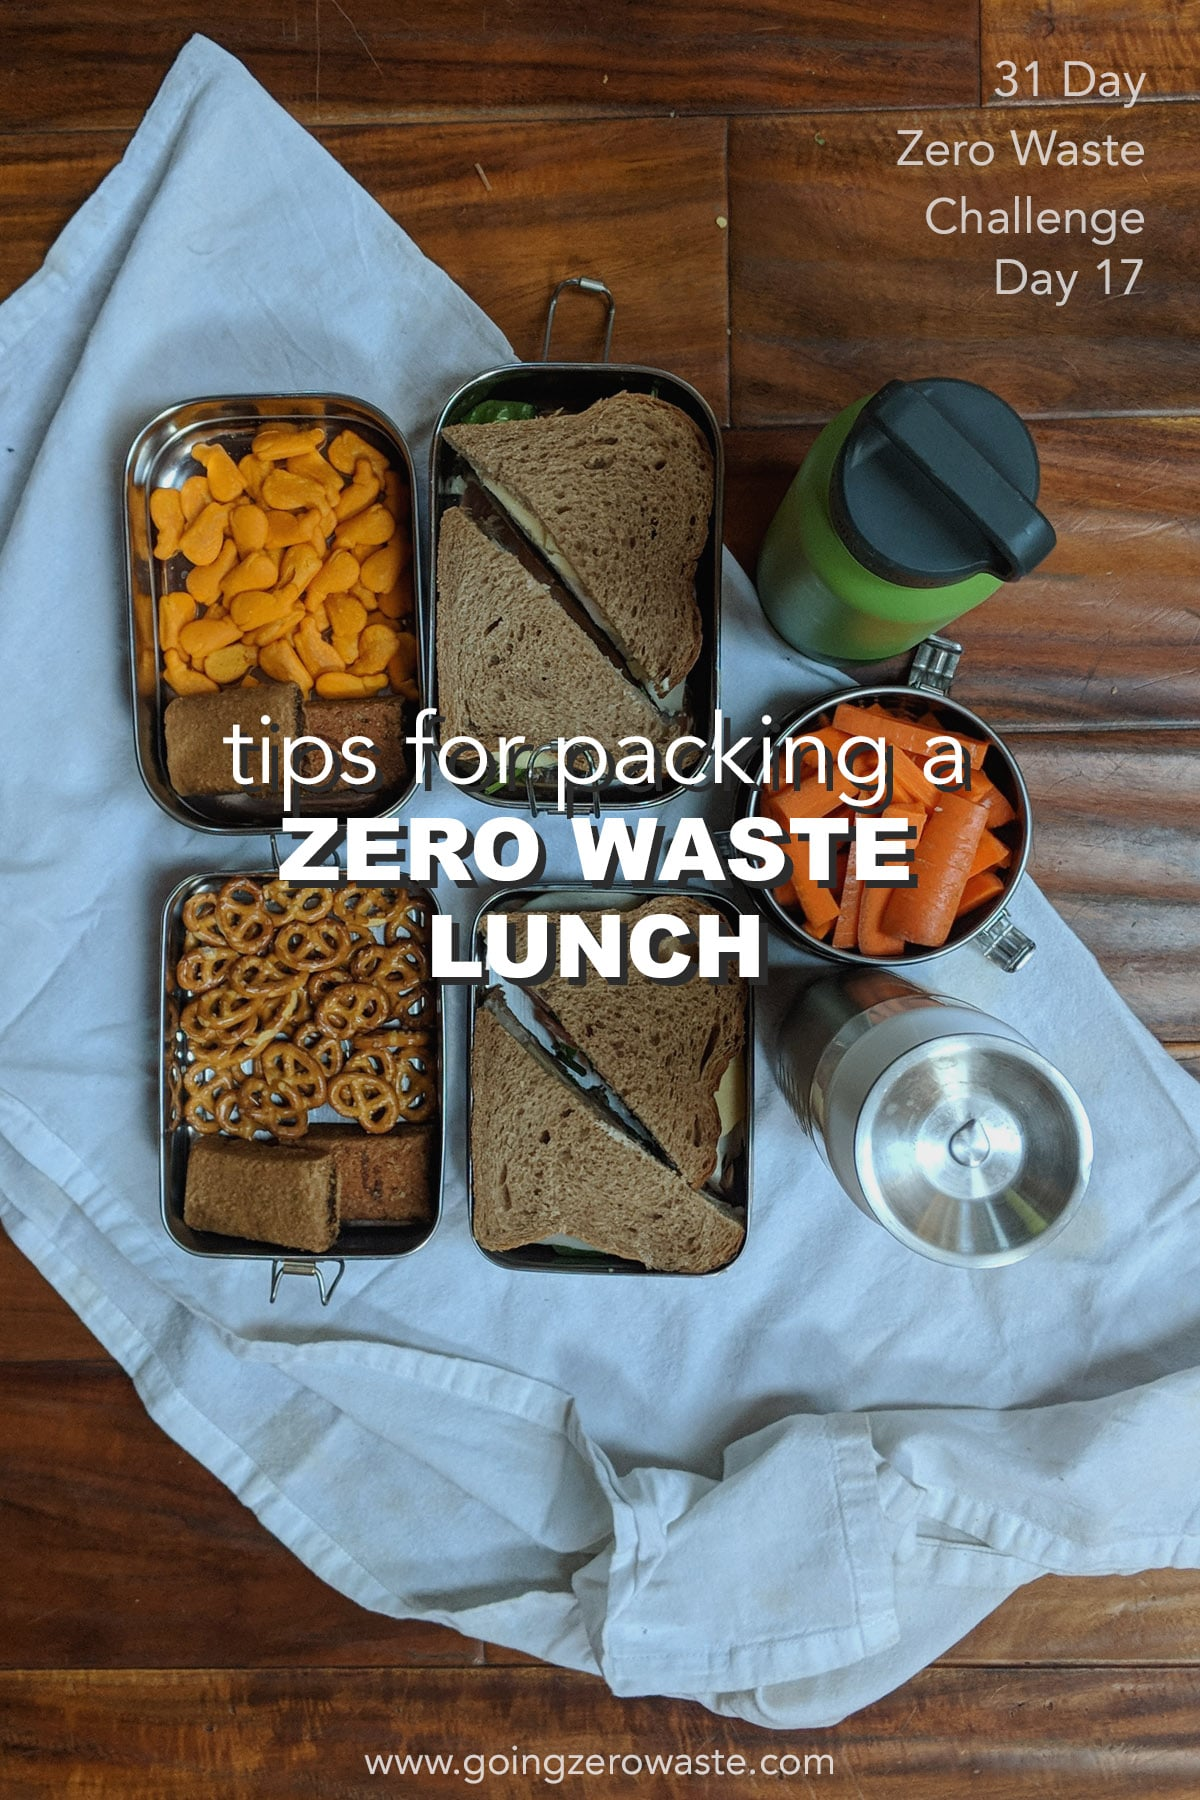 Pack a Zero Waste Lunch - Day 17 of the Zero Waste Challenge